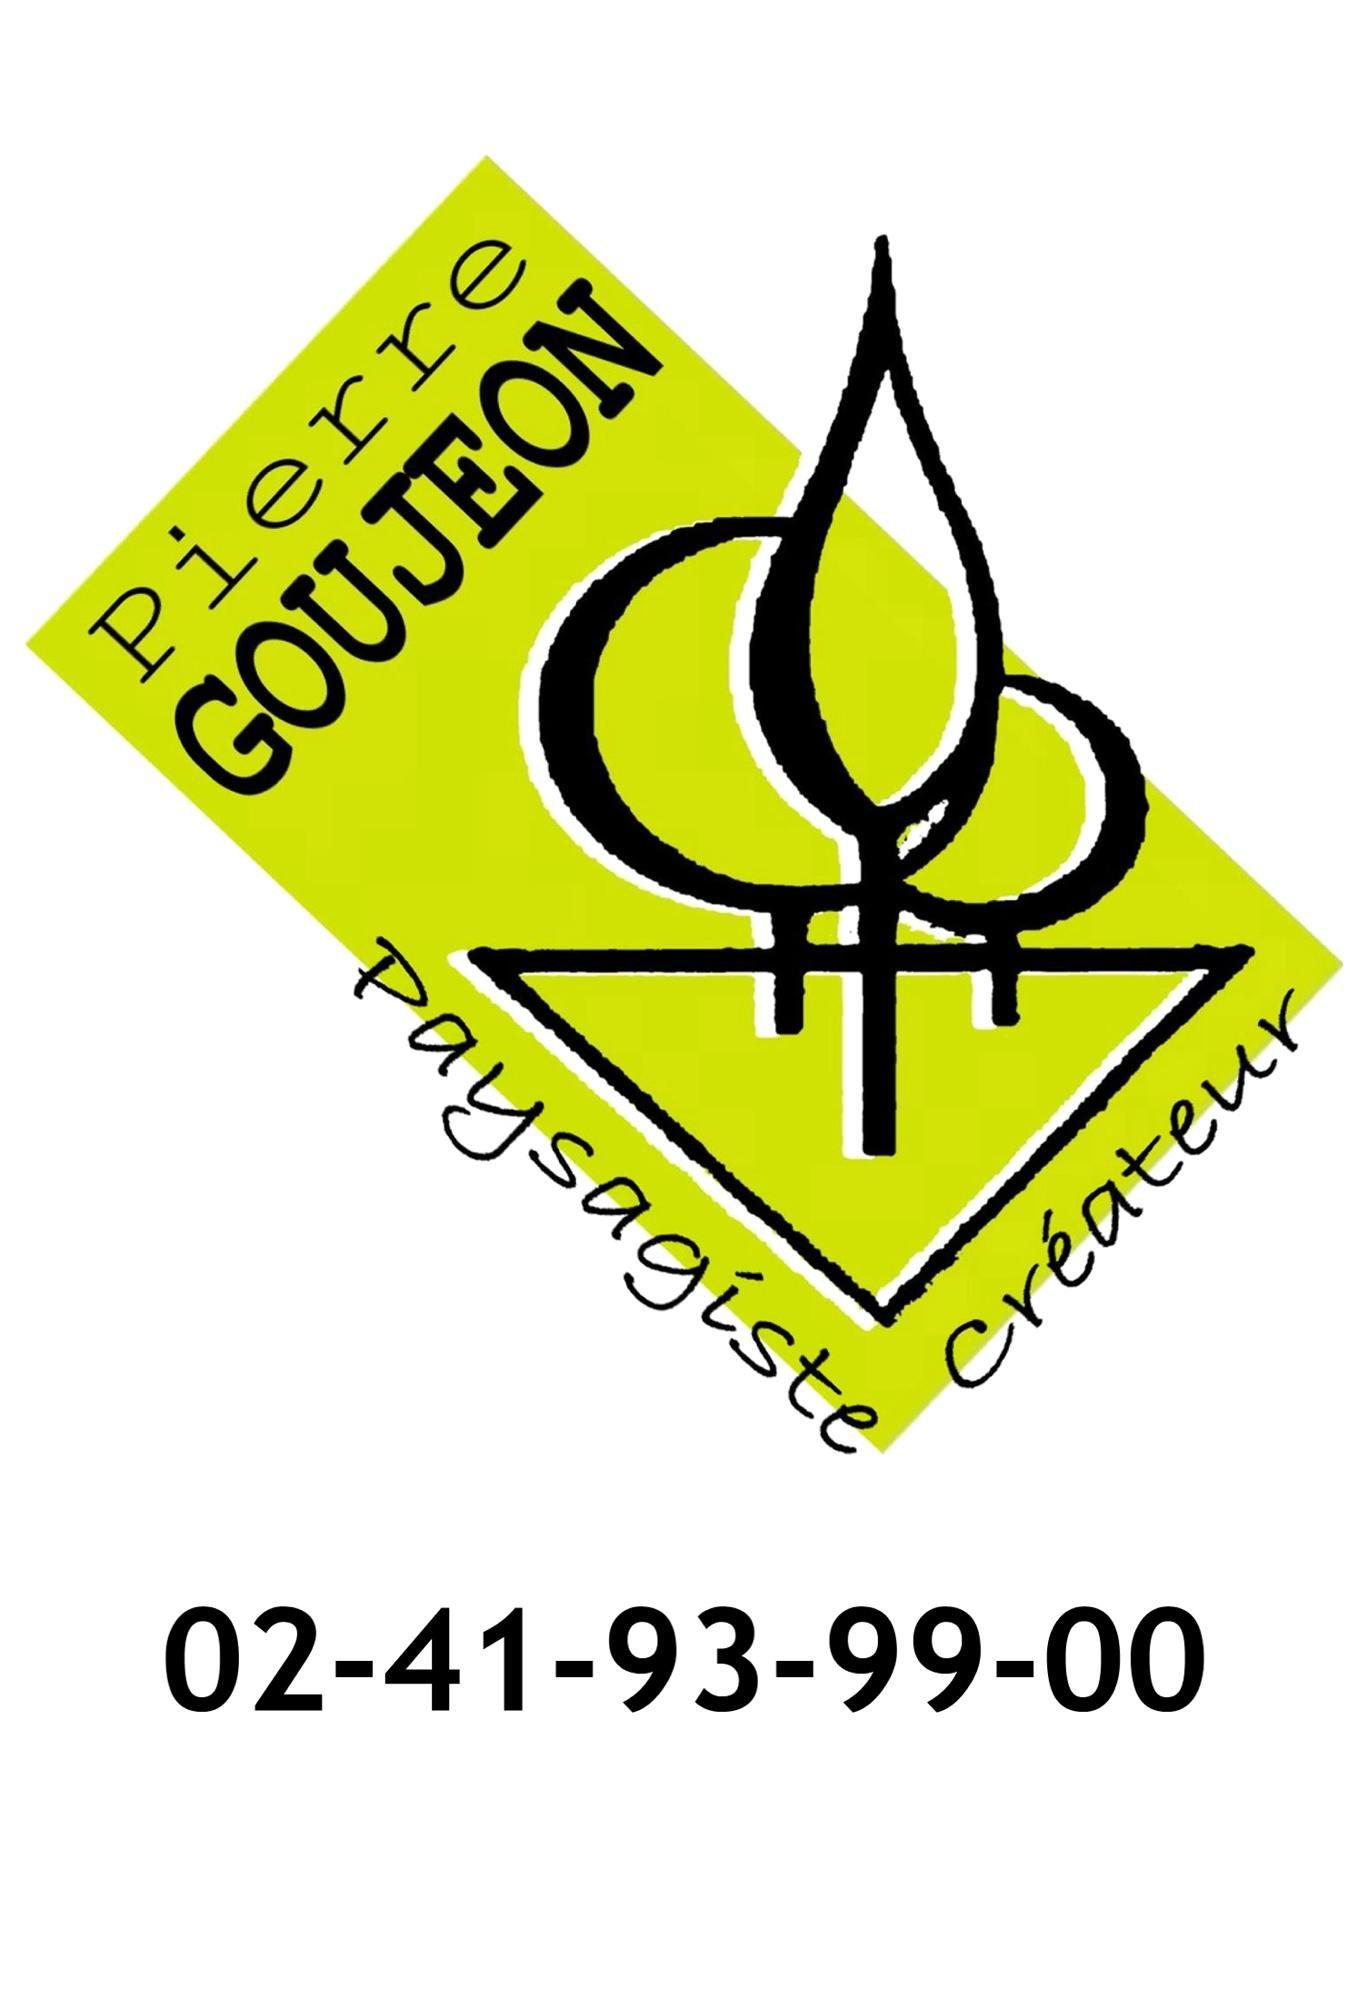 gougeon